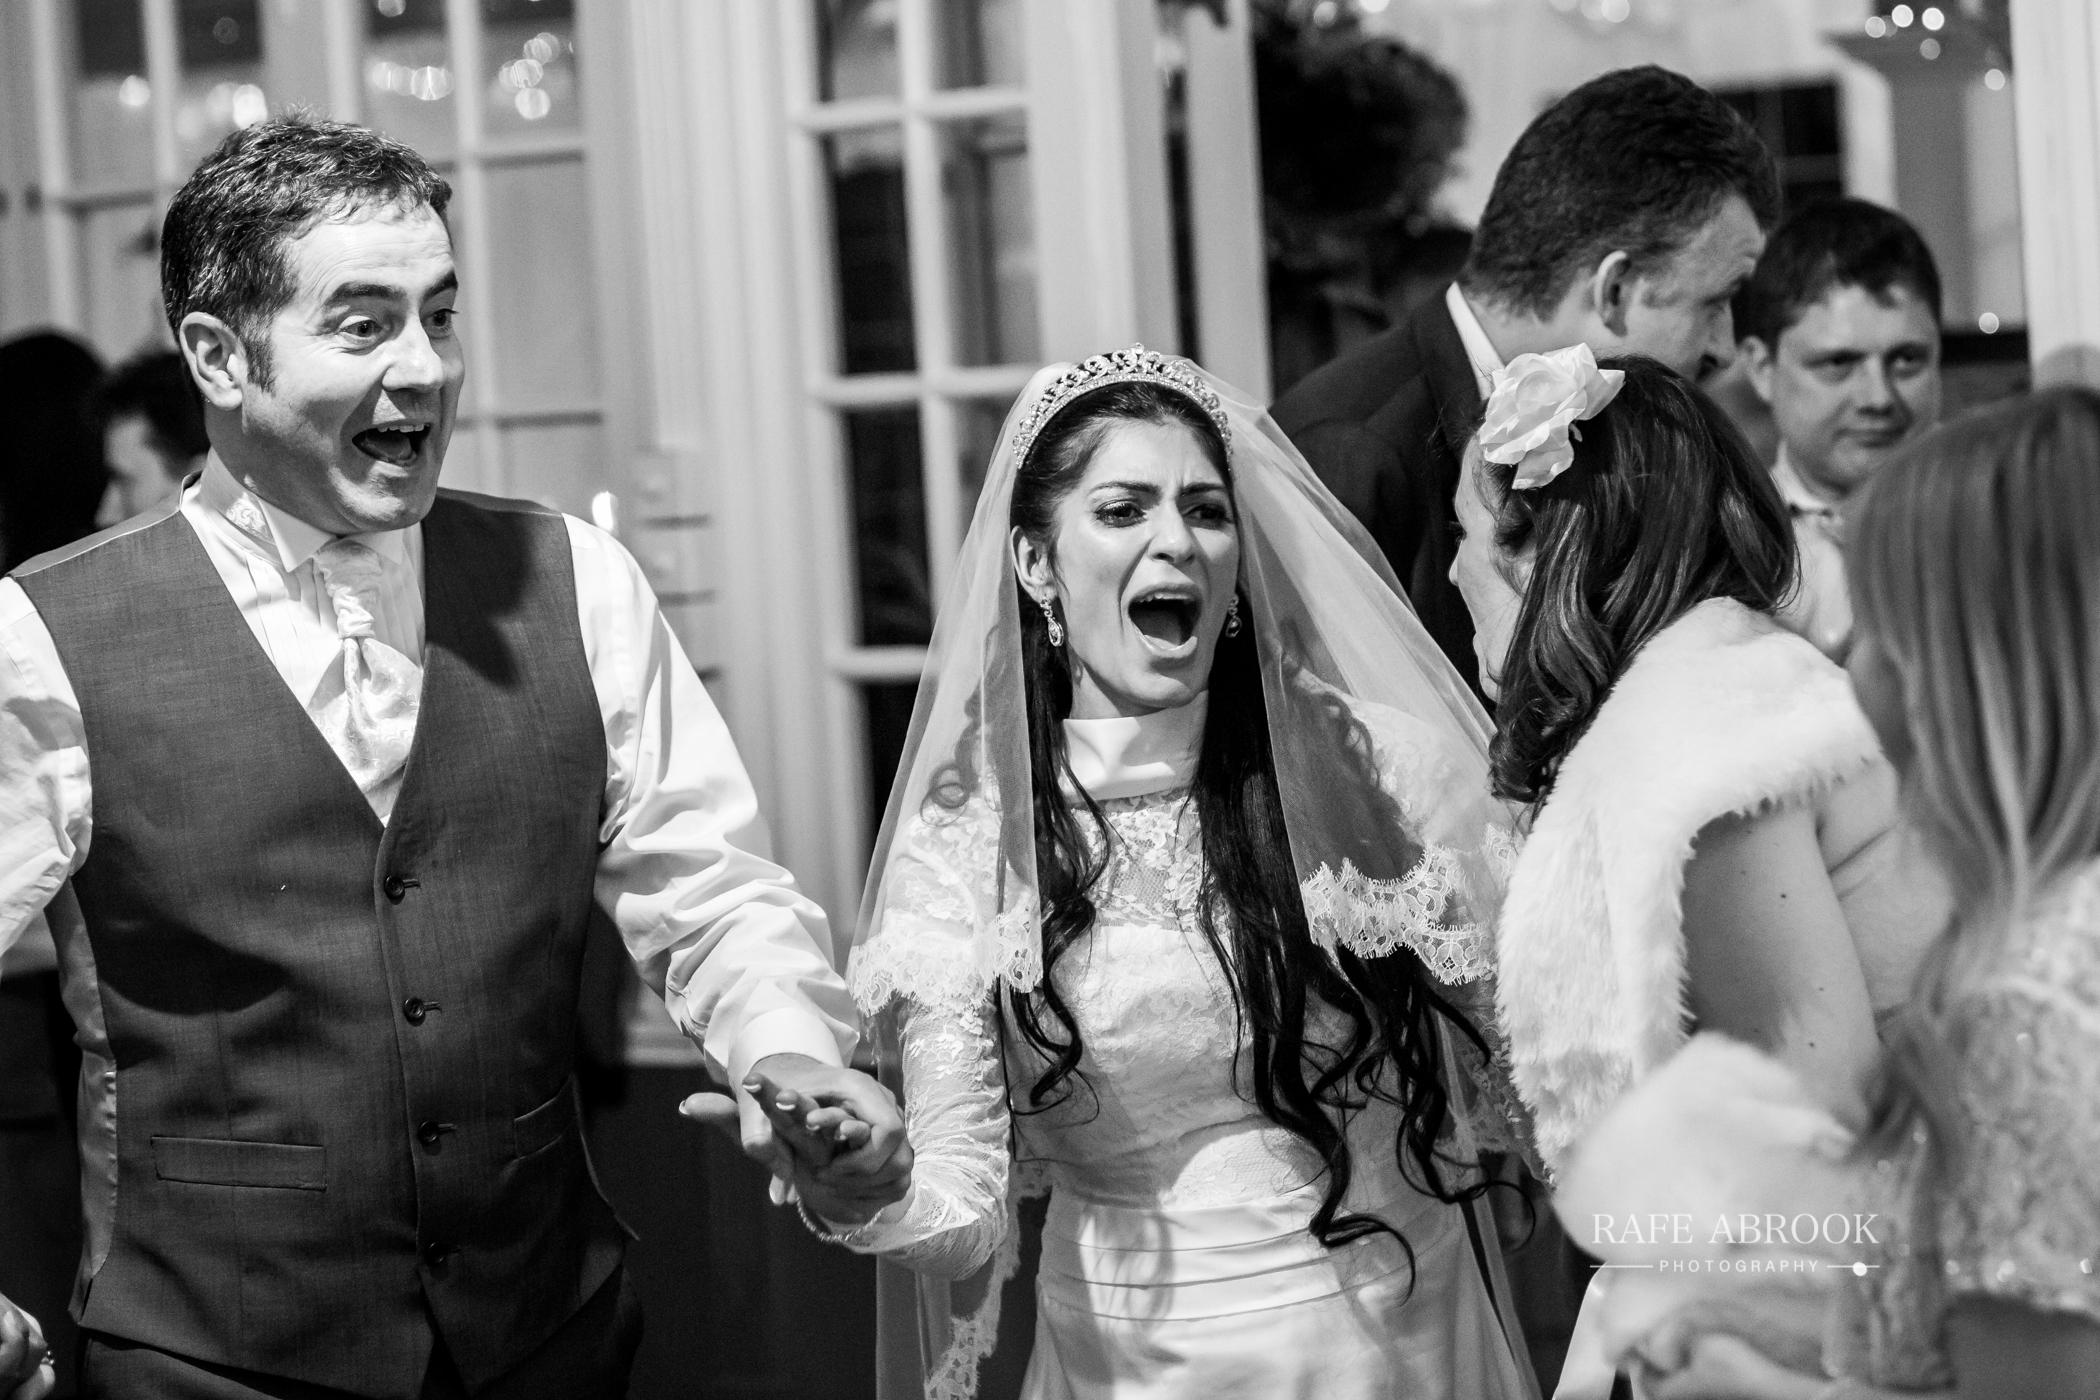 roma & pete wedding hampstead shenley hertfordshire -527.jpg